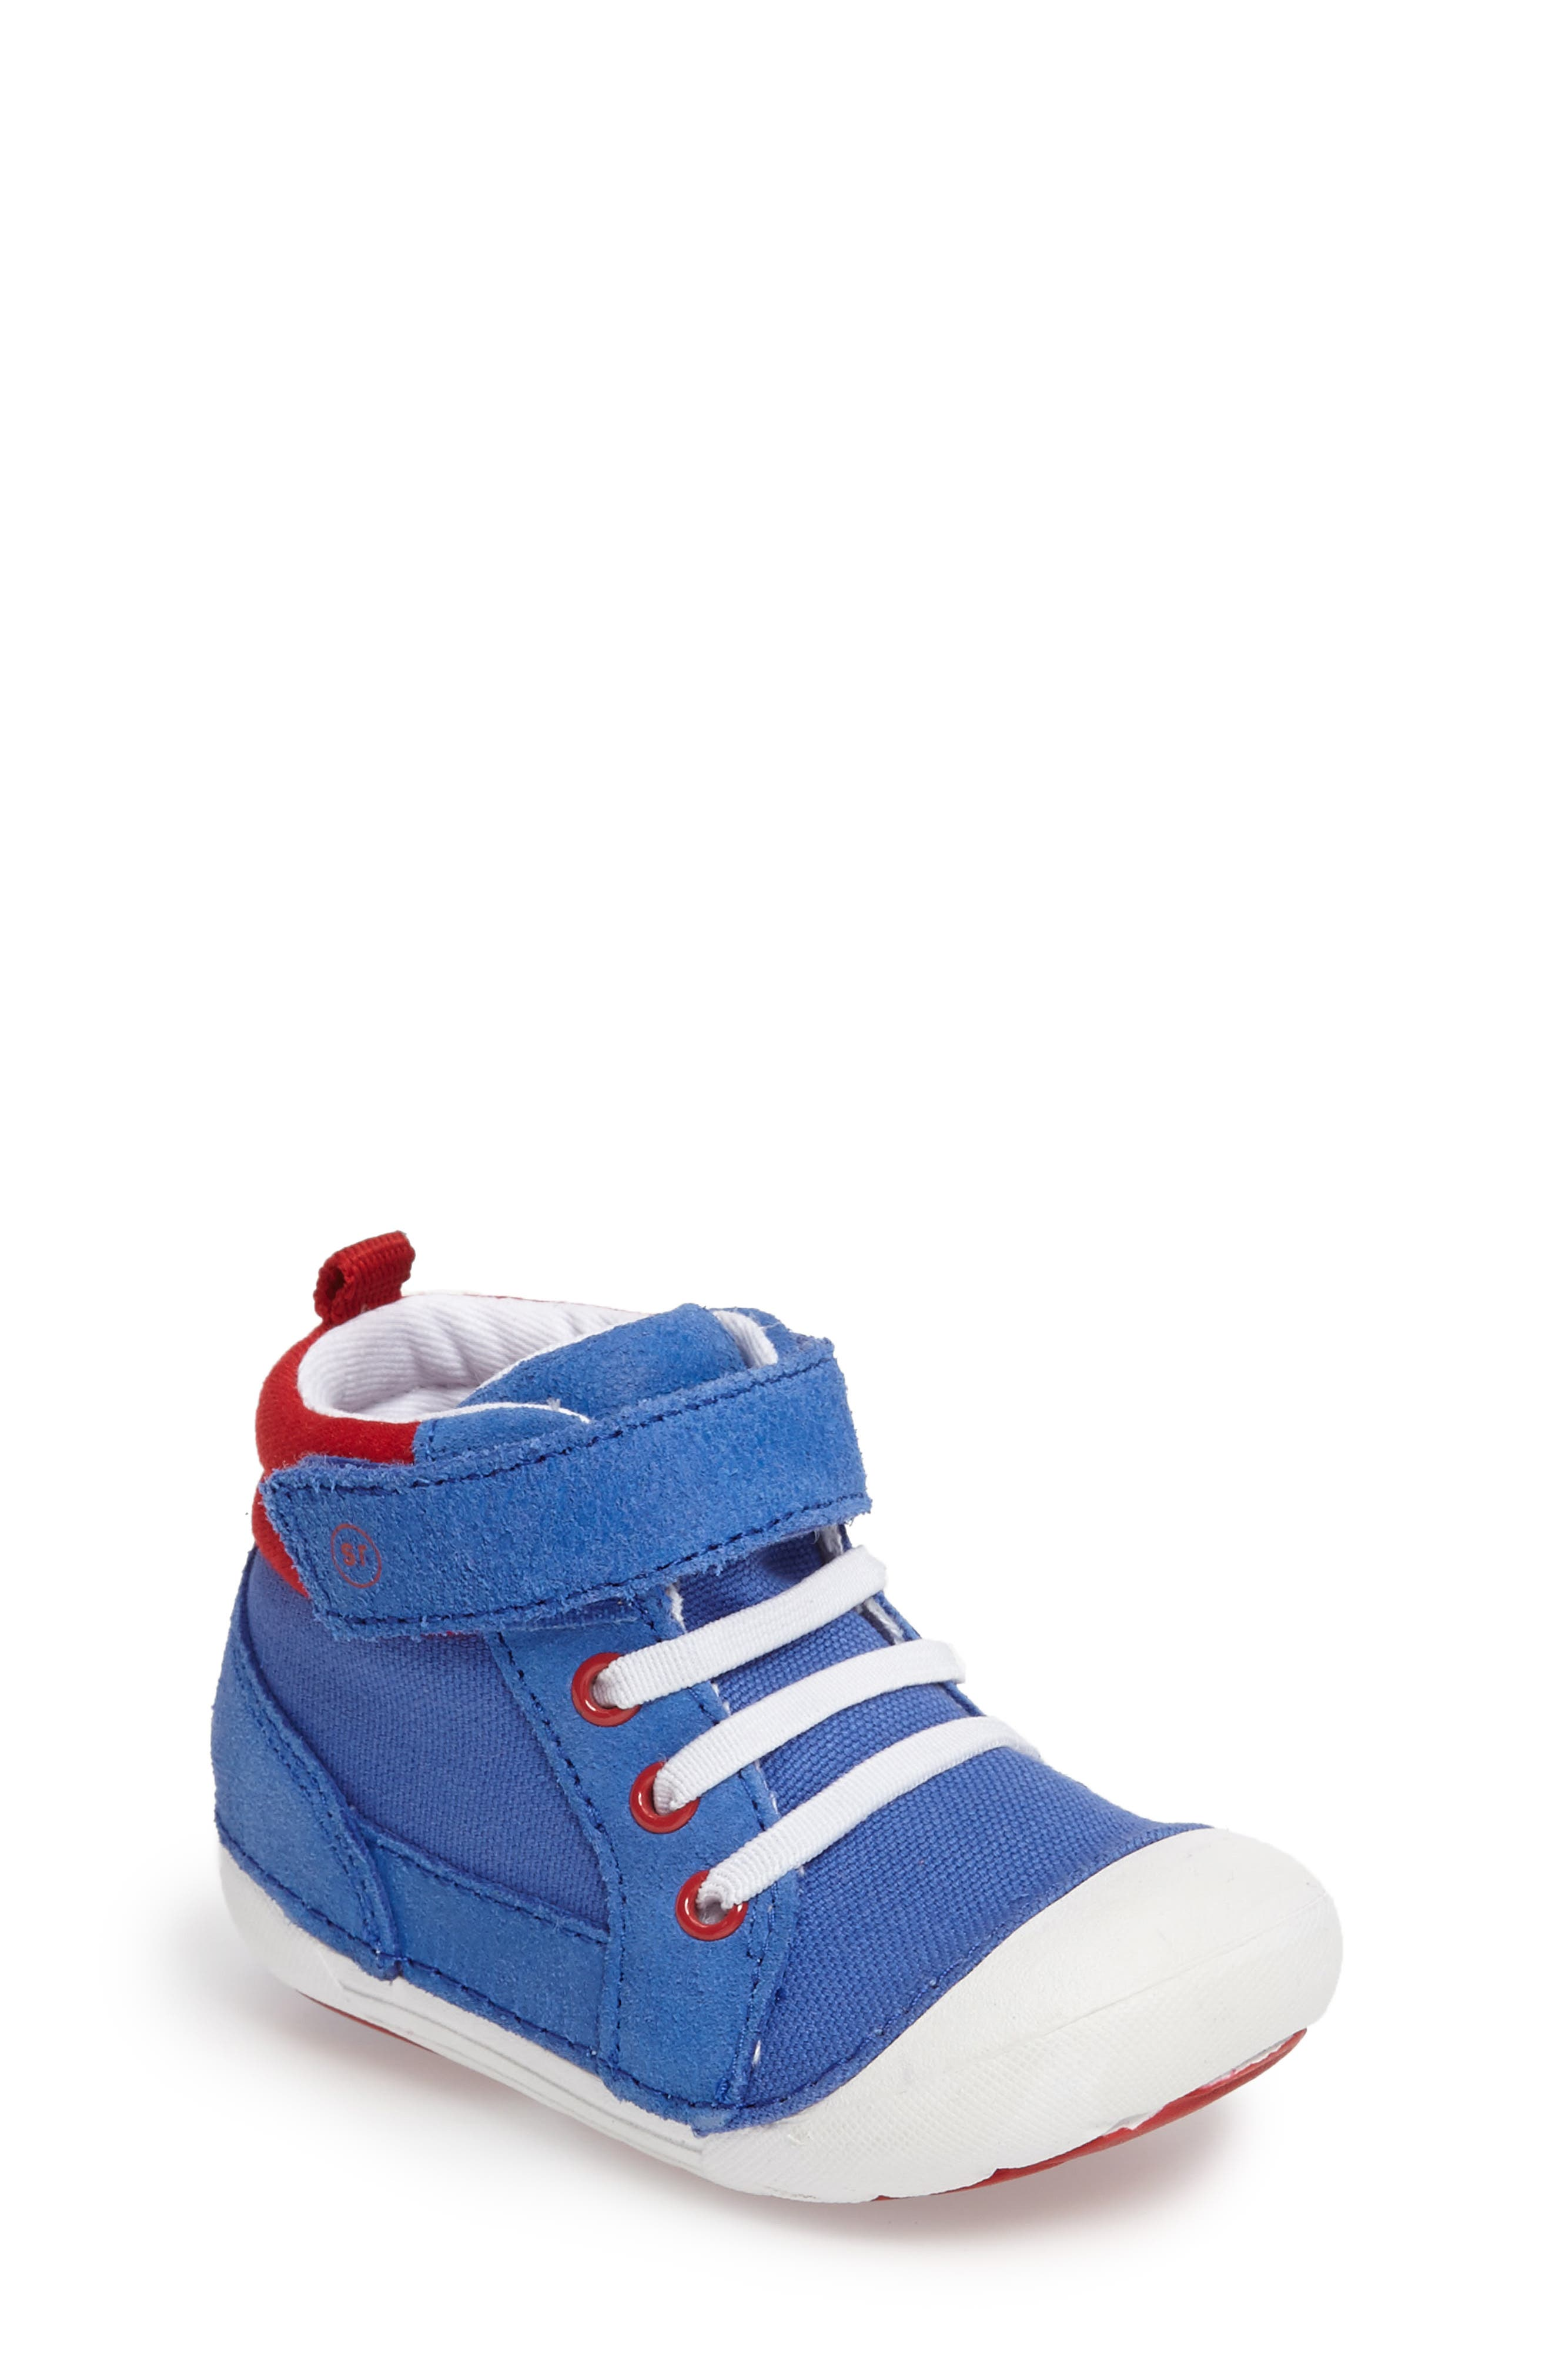 Soft Motion Danny Sneaker,                             Alternate thumbnail 8, color,